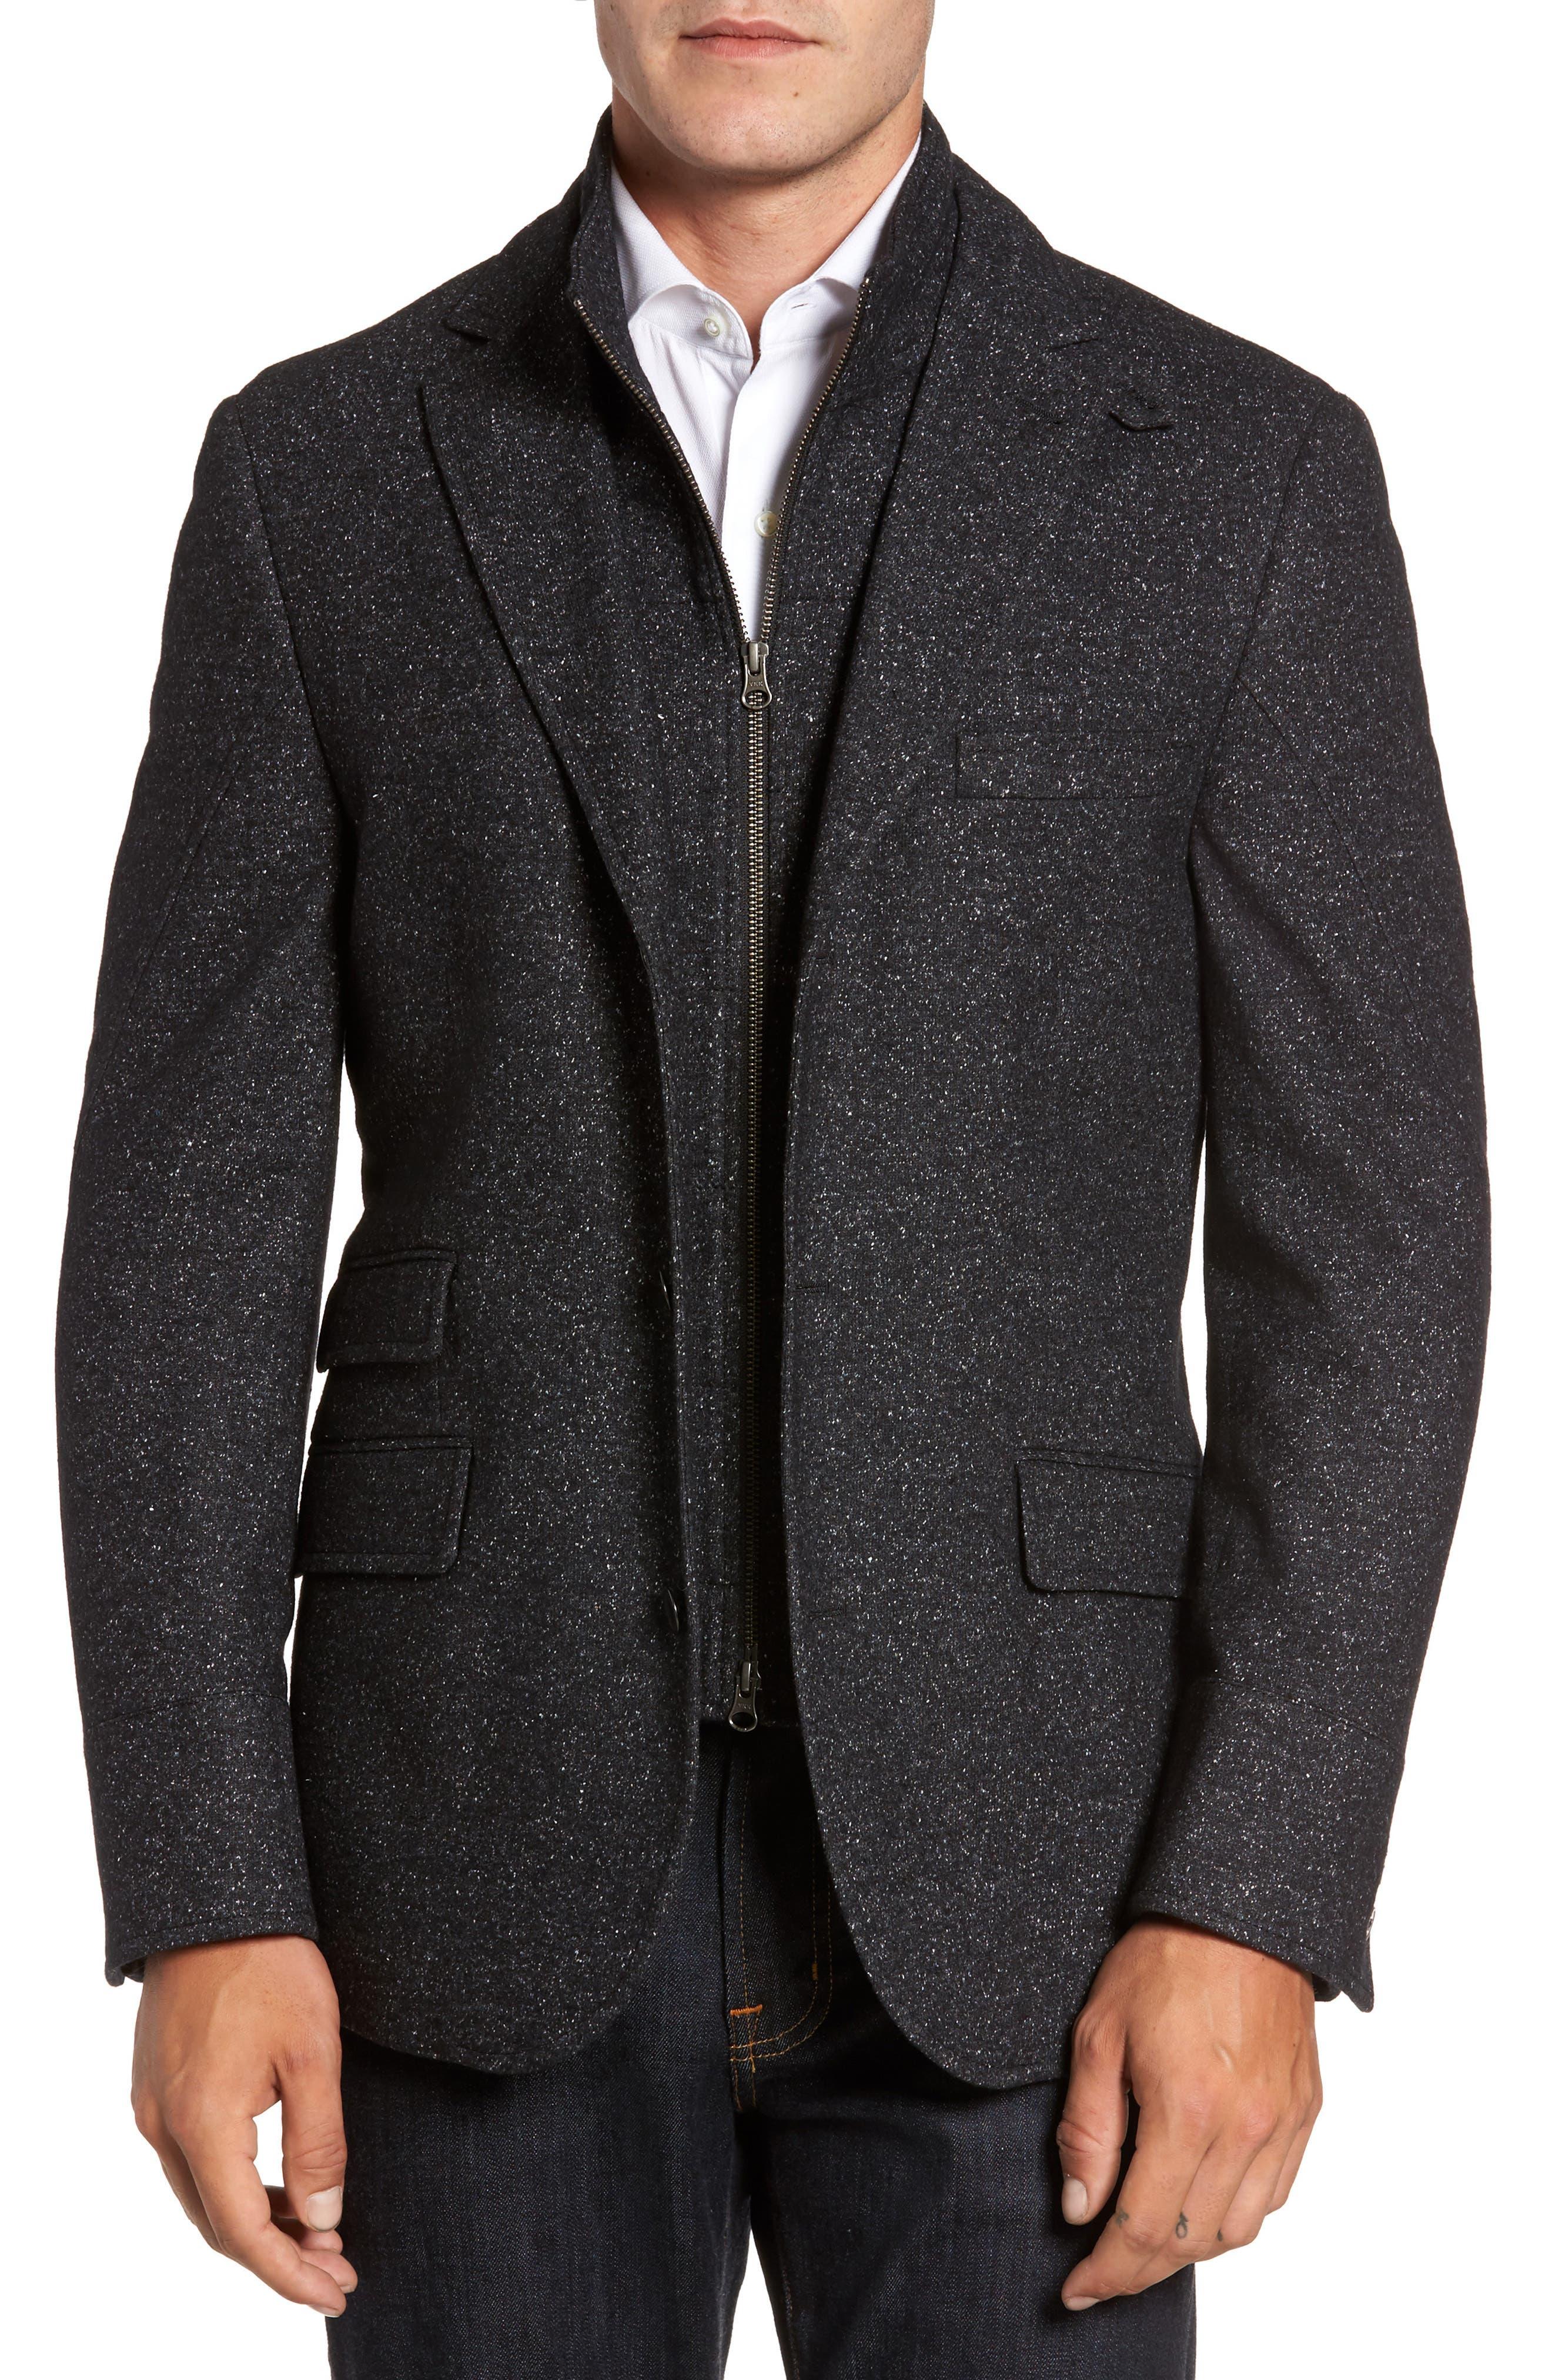 Donegal Wool Blend Hybrid Coat,                             Main thumbnail 1, color,                             021